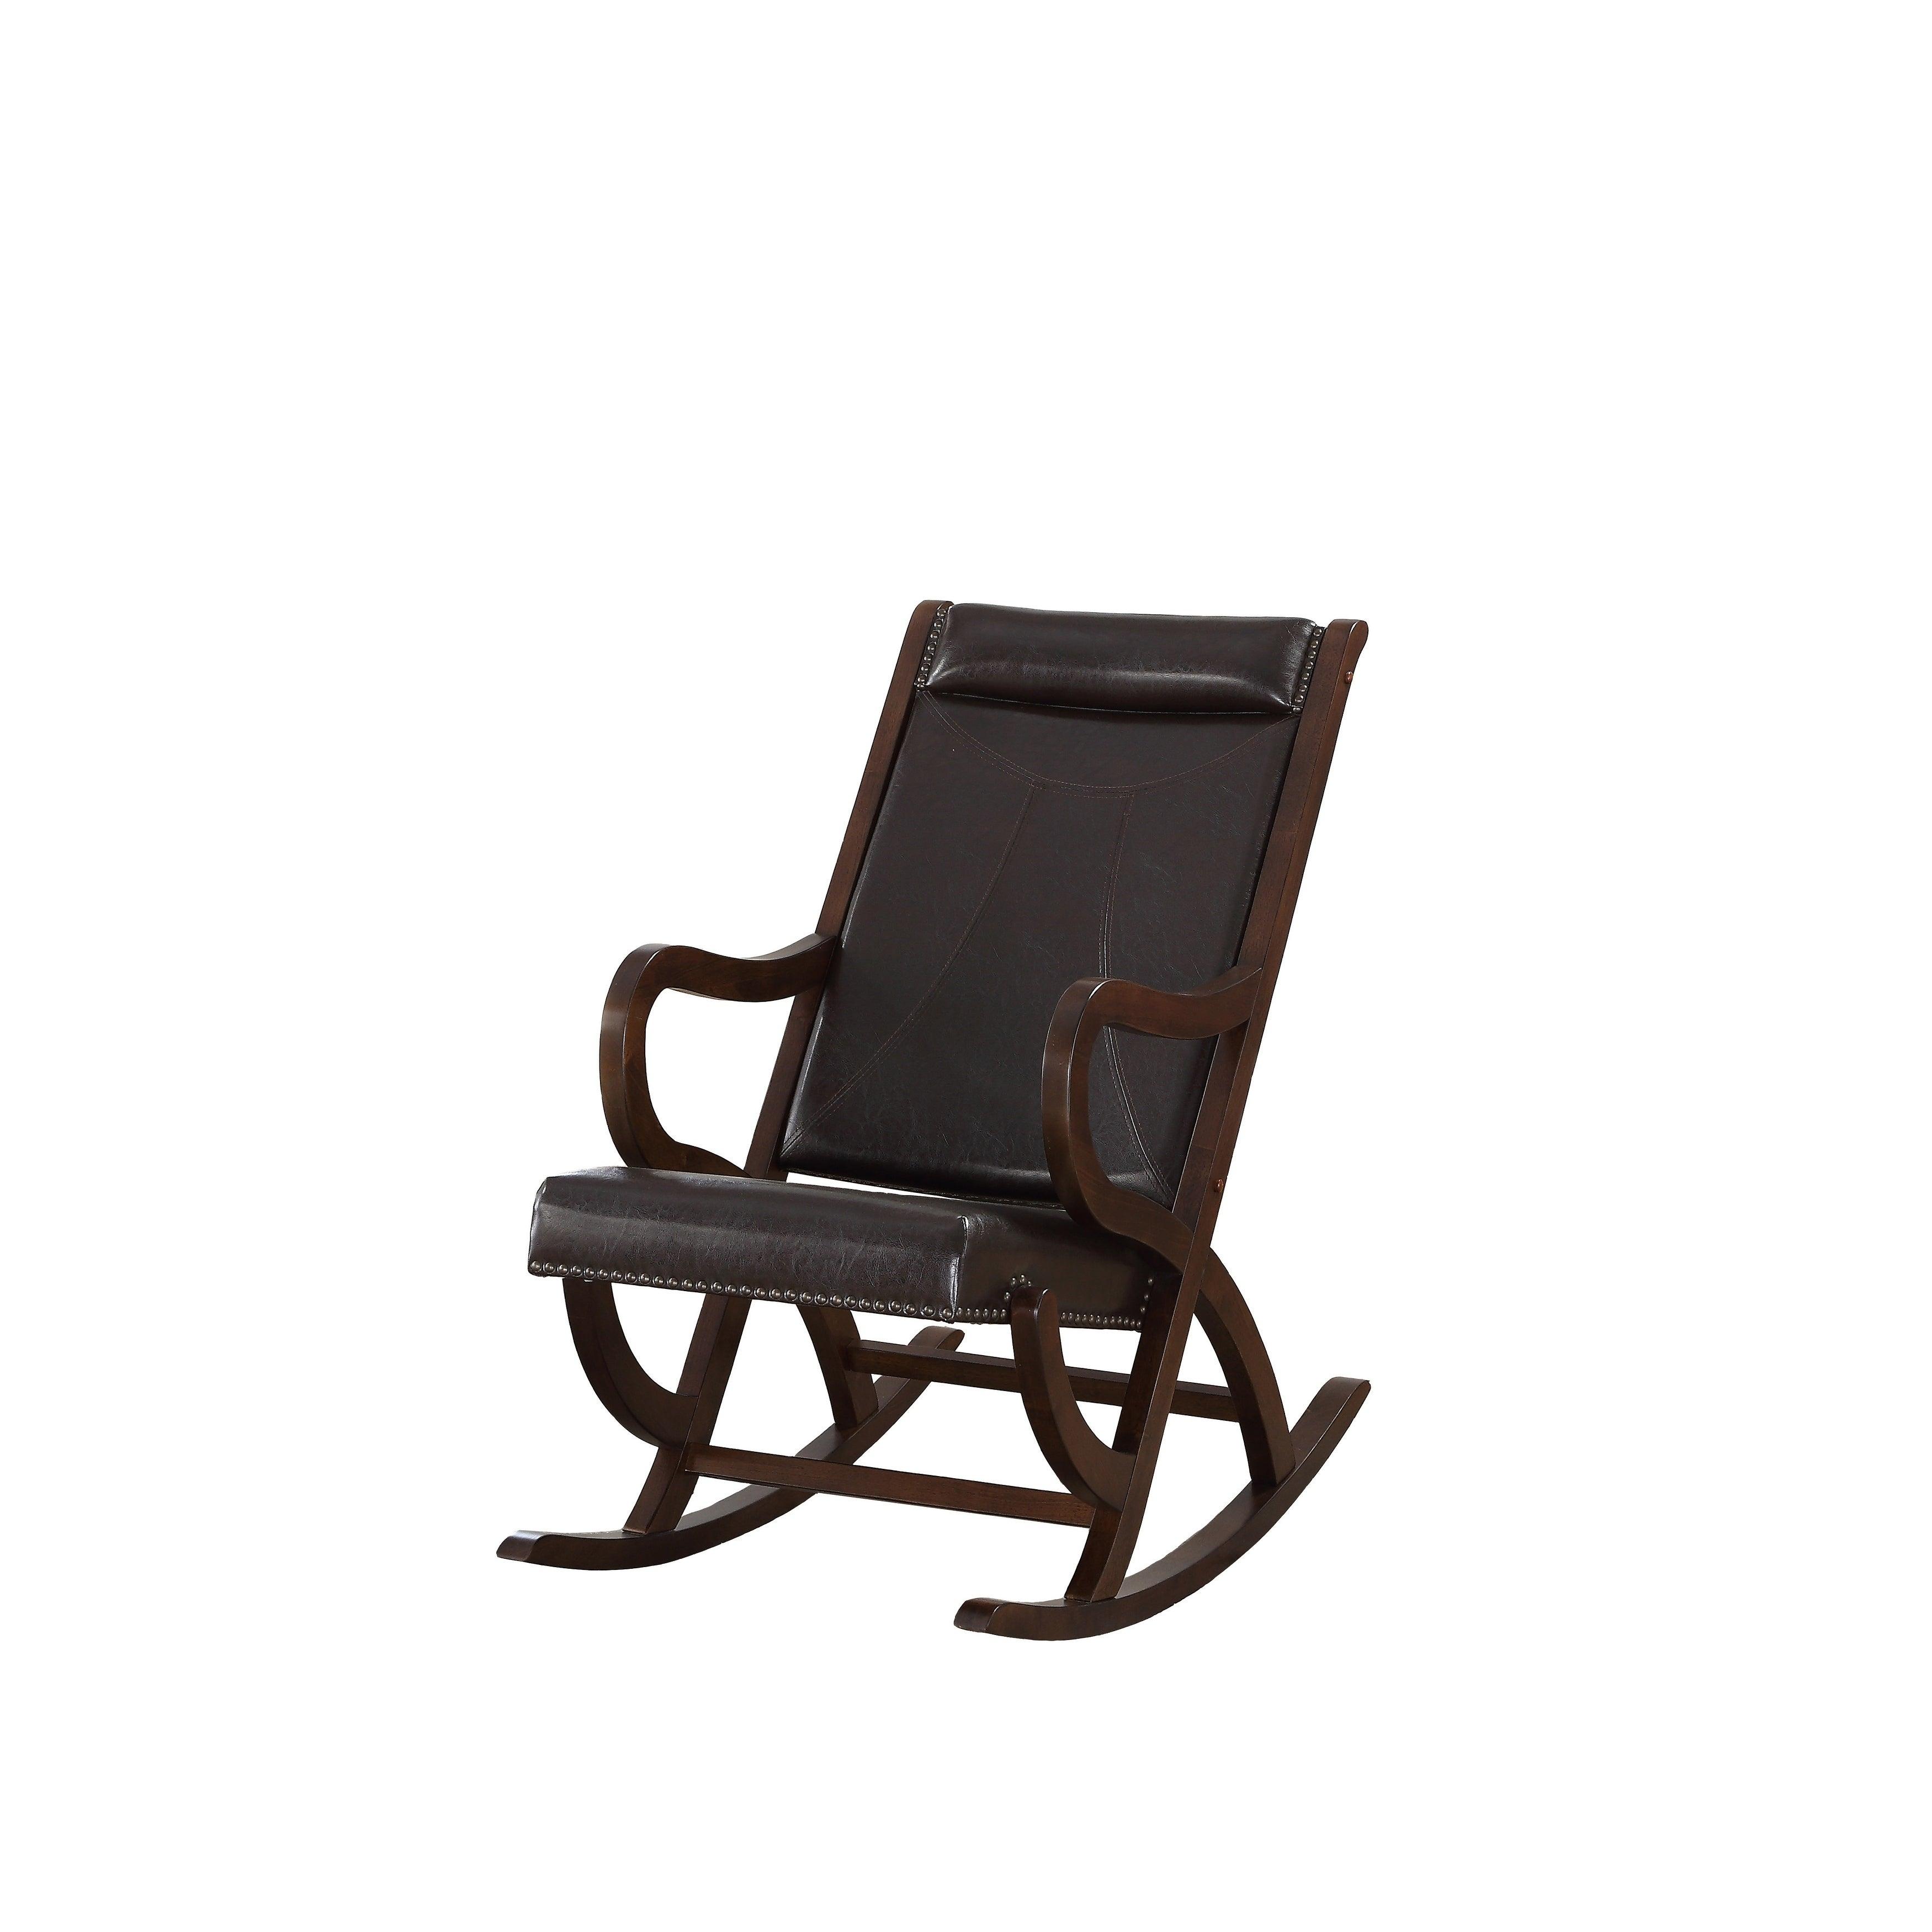 Carbon Loft Ariel Rocking Chair In Espresso Pu And Walnut Regarding Espresso Brown Rocking Chairs (View 8 of 20)